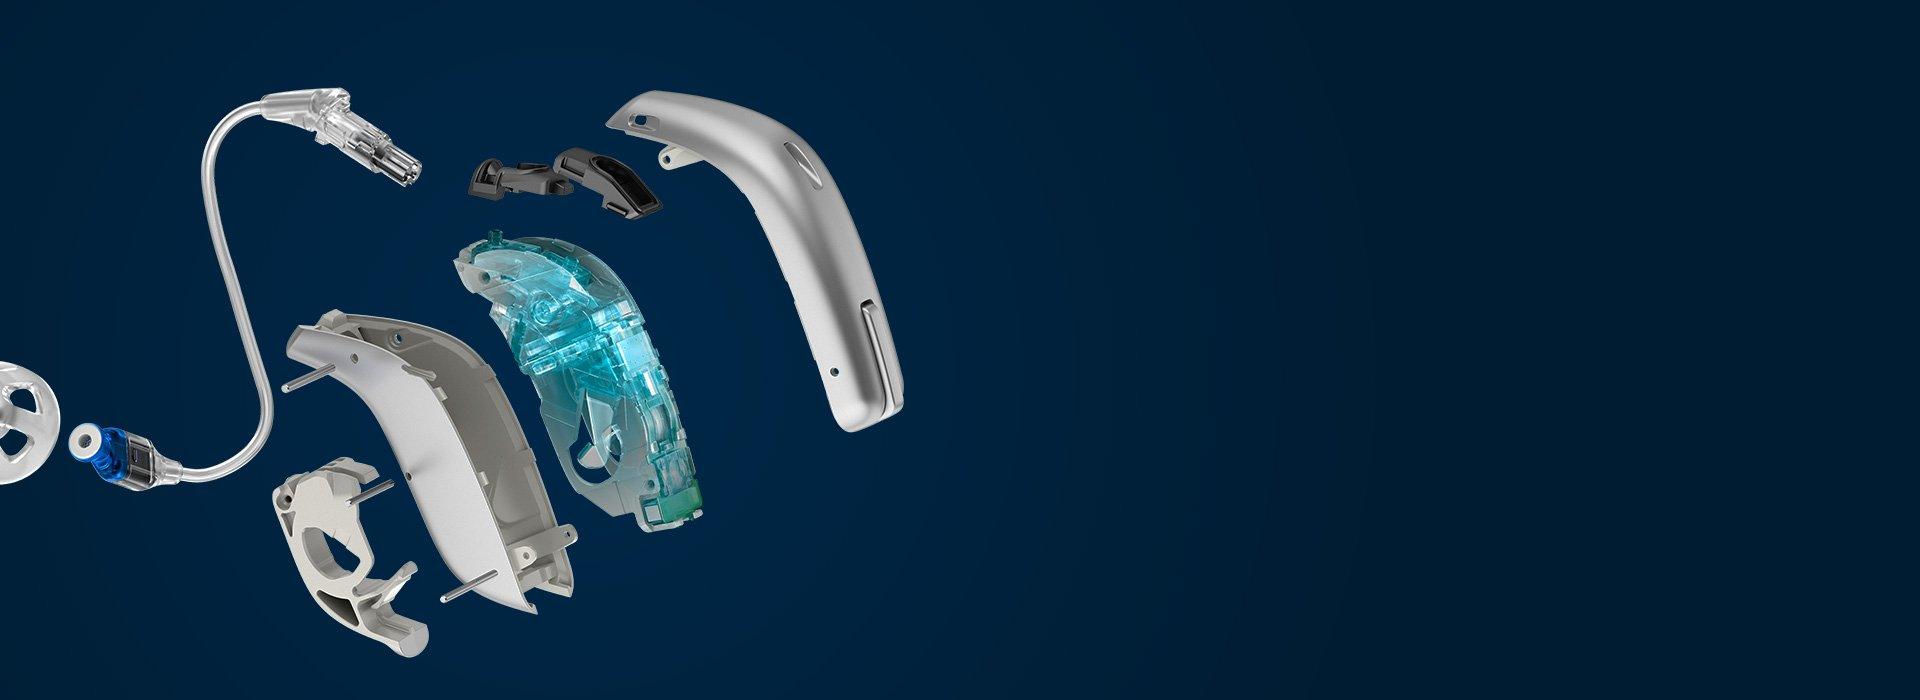 hearing-aids-hearing-aid-technology